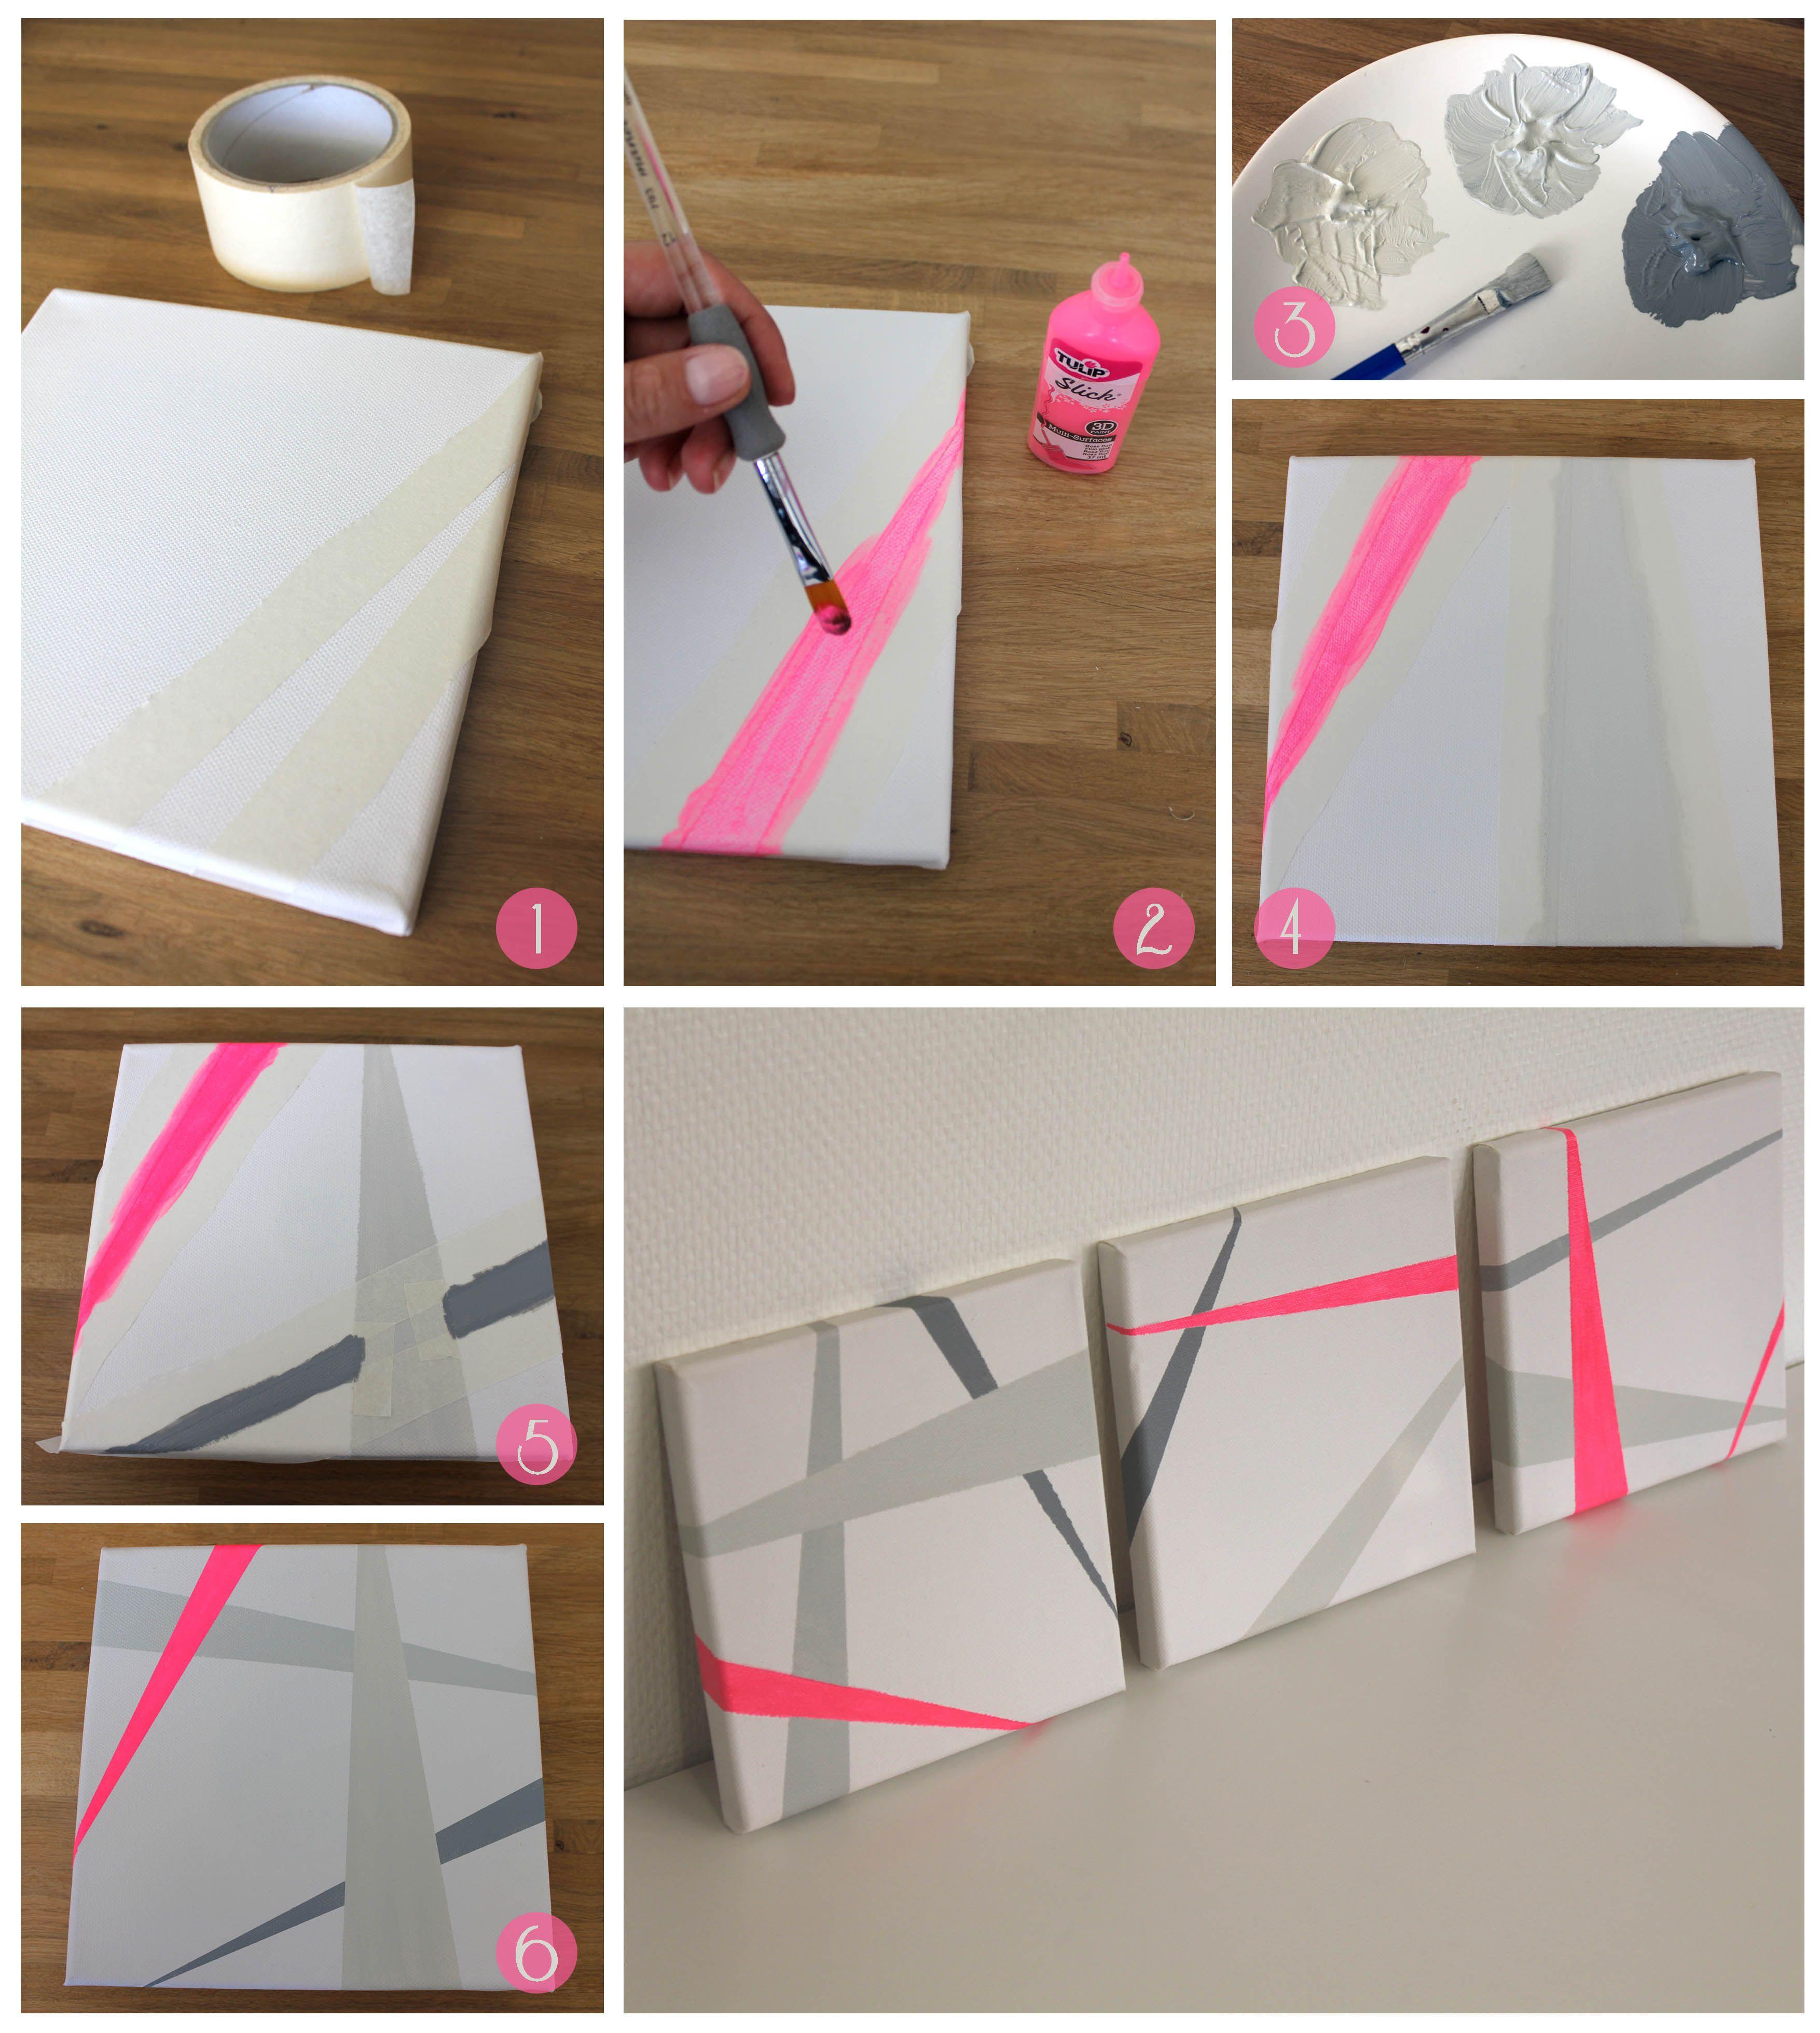 tutoriel tableau fluo do it yourself diy apartment decor diy wall art et diy painting. Black Bedroom Furniture Sets. Home Design Ideas